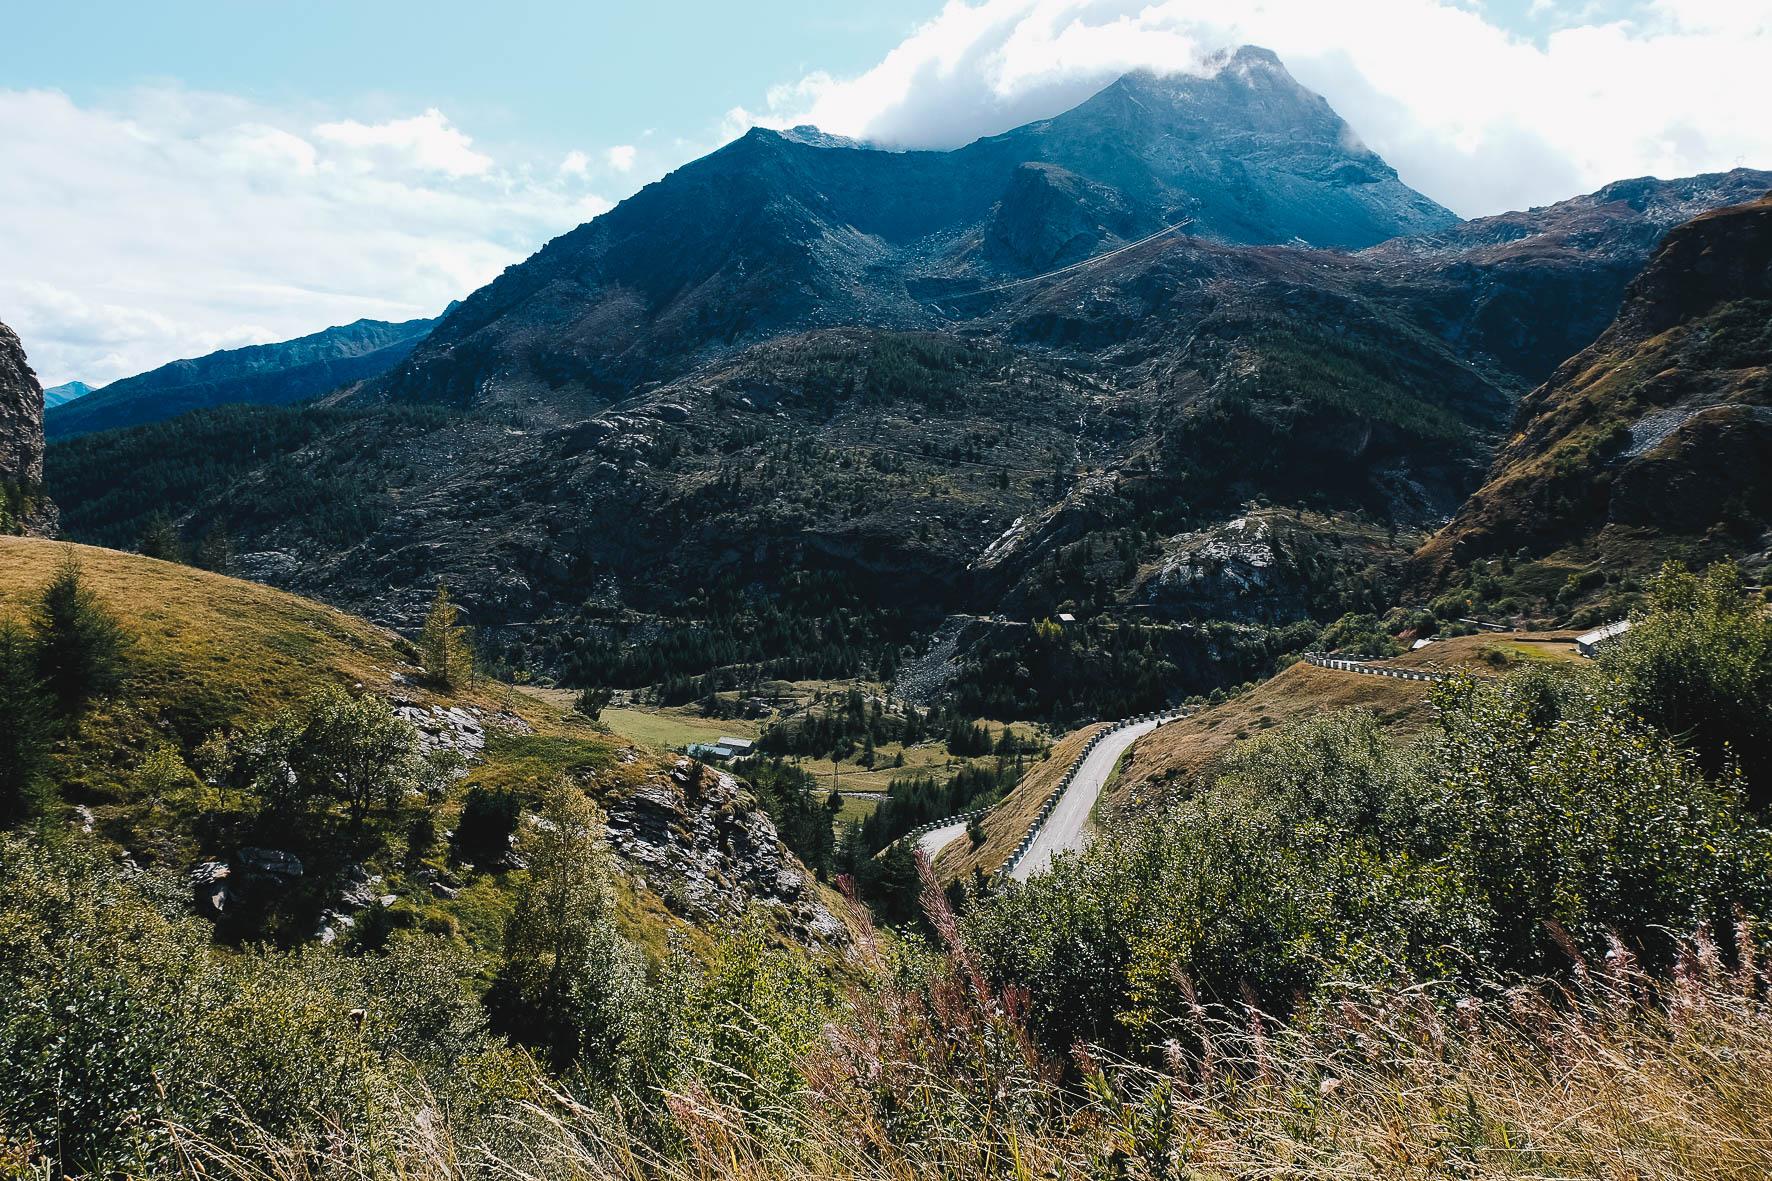 Carnet Sauvage - Blog voyage Lille - Visiter la France - Le col du Mont Cenis